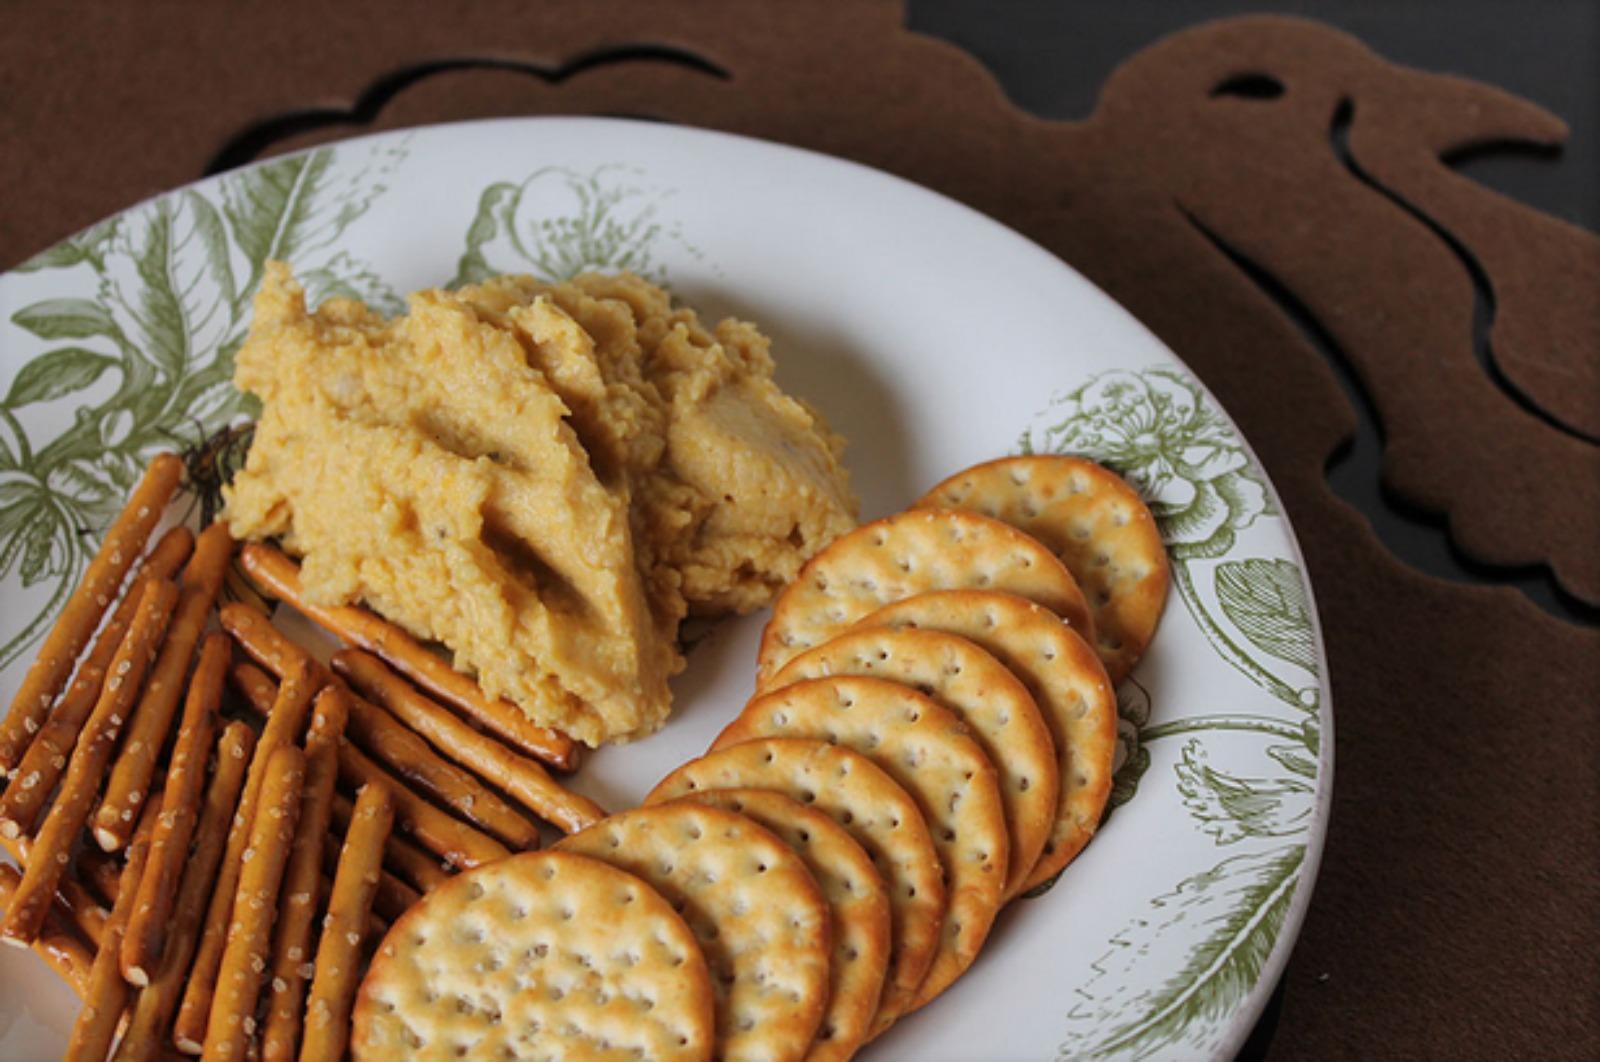 Savory Pumpkin Hummus [Vegan]